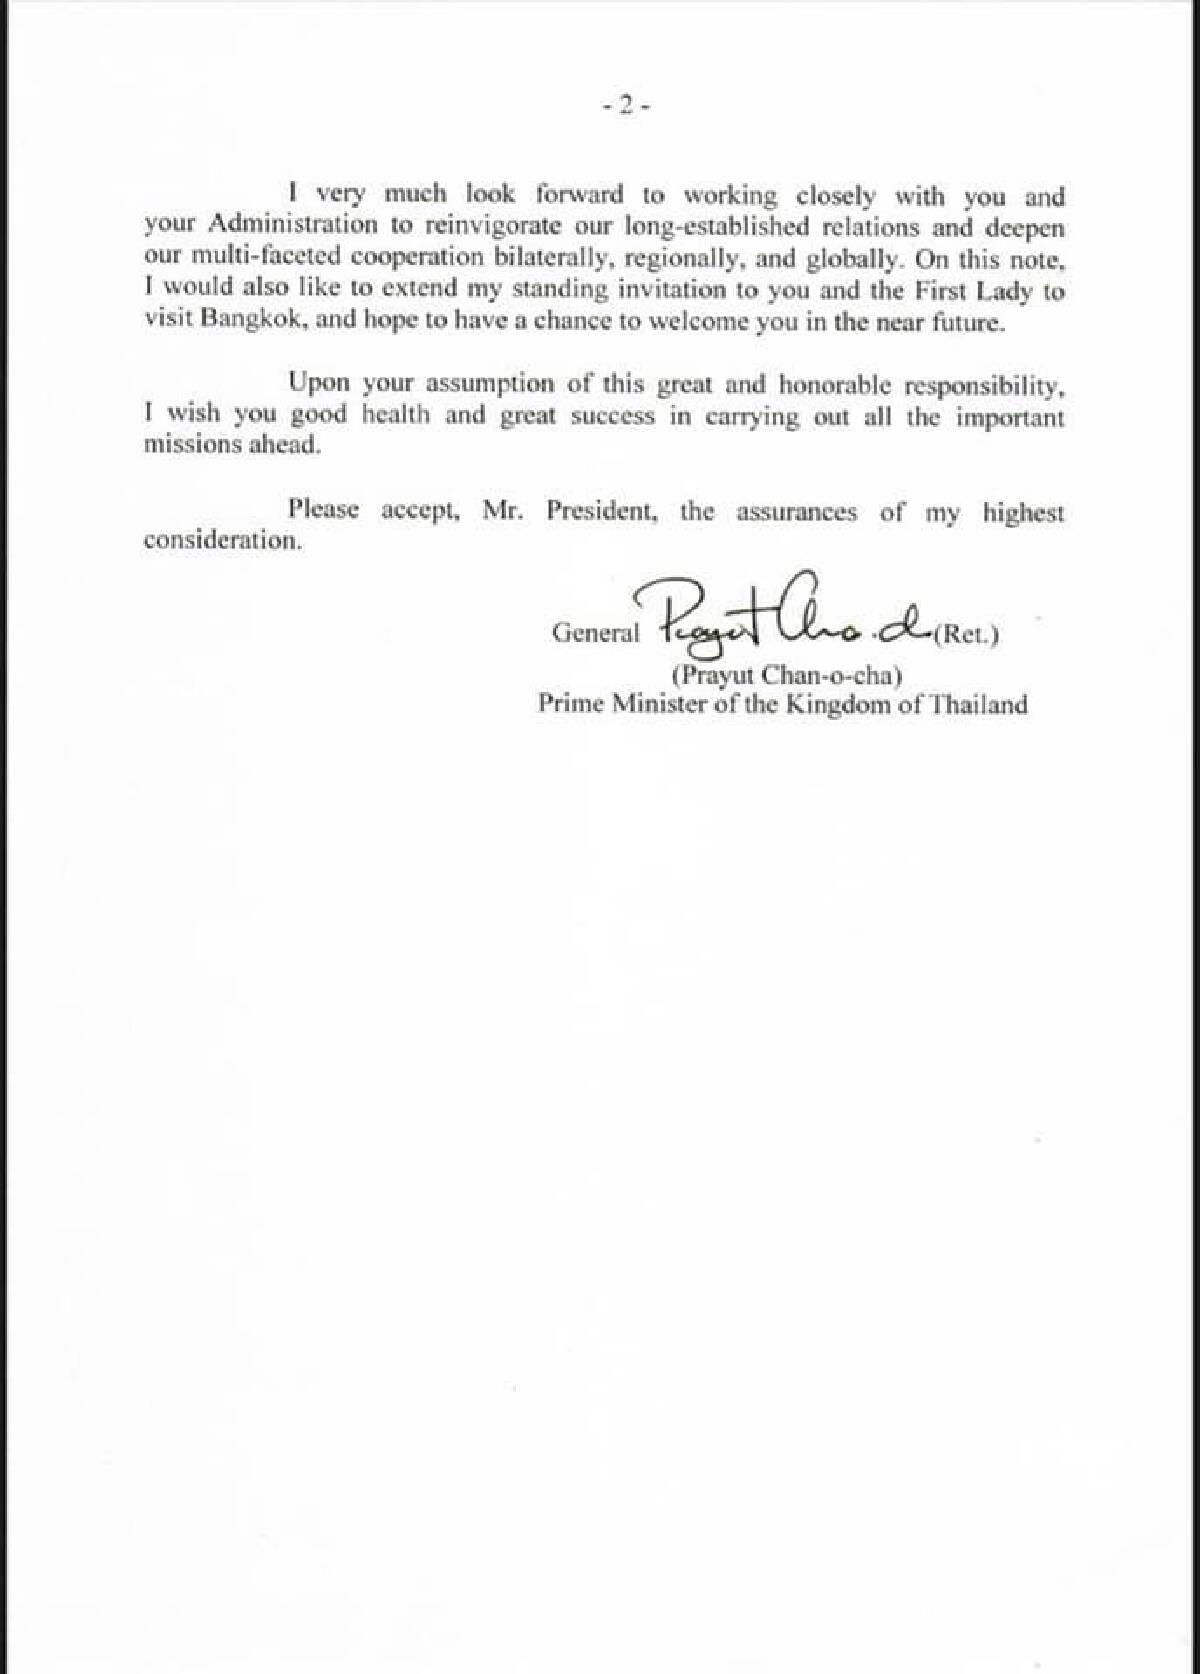 Prayut congratulates Biden on inauguration, calls for global unity